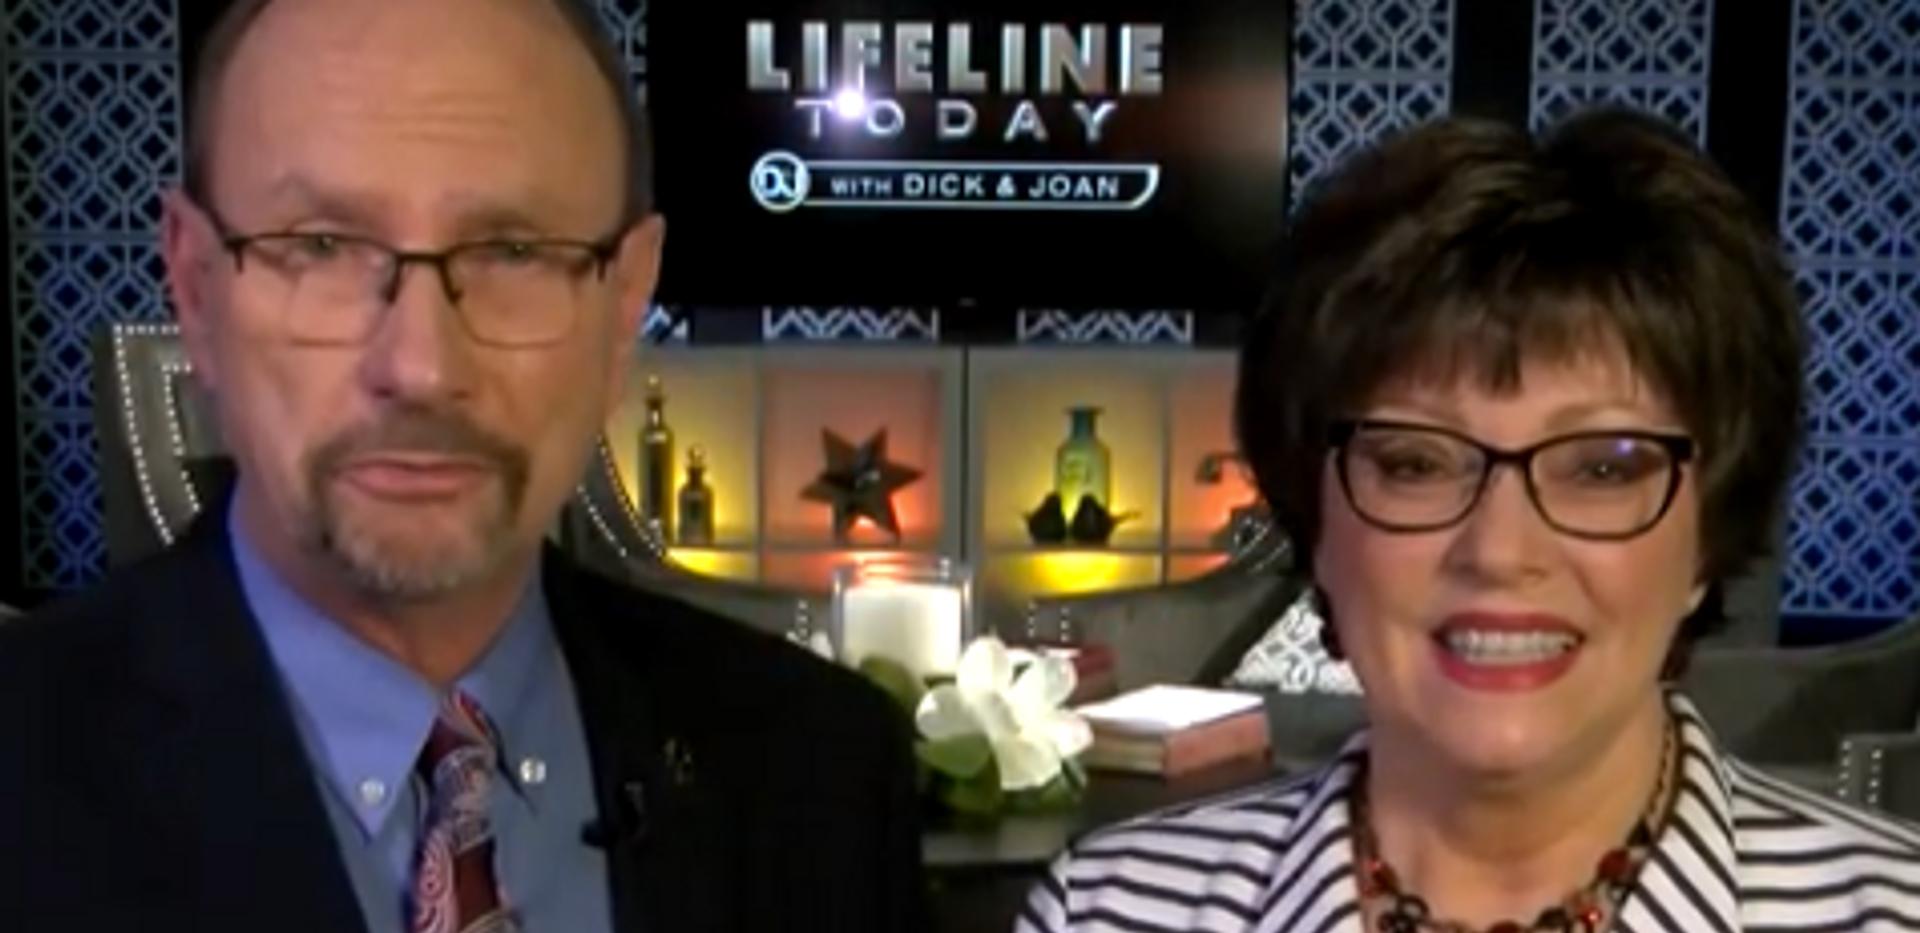 LIFELINE TODAY | Season 6, Episode 205